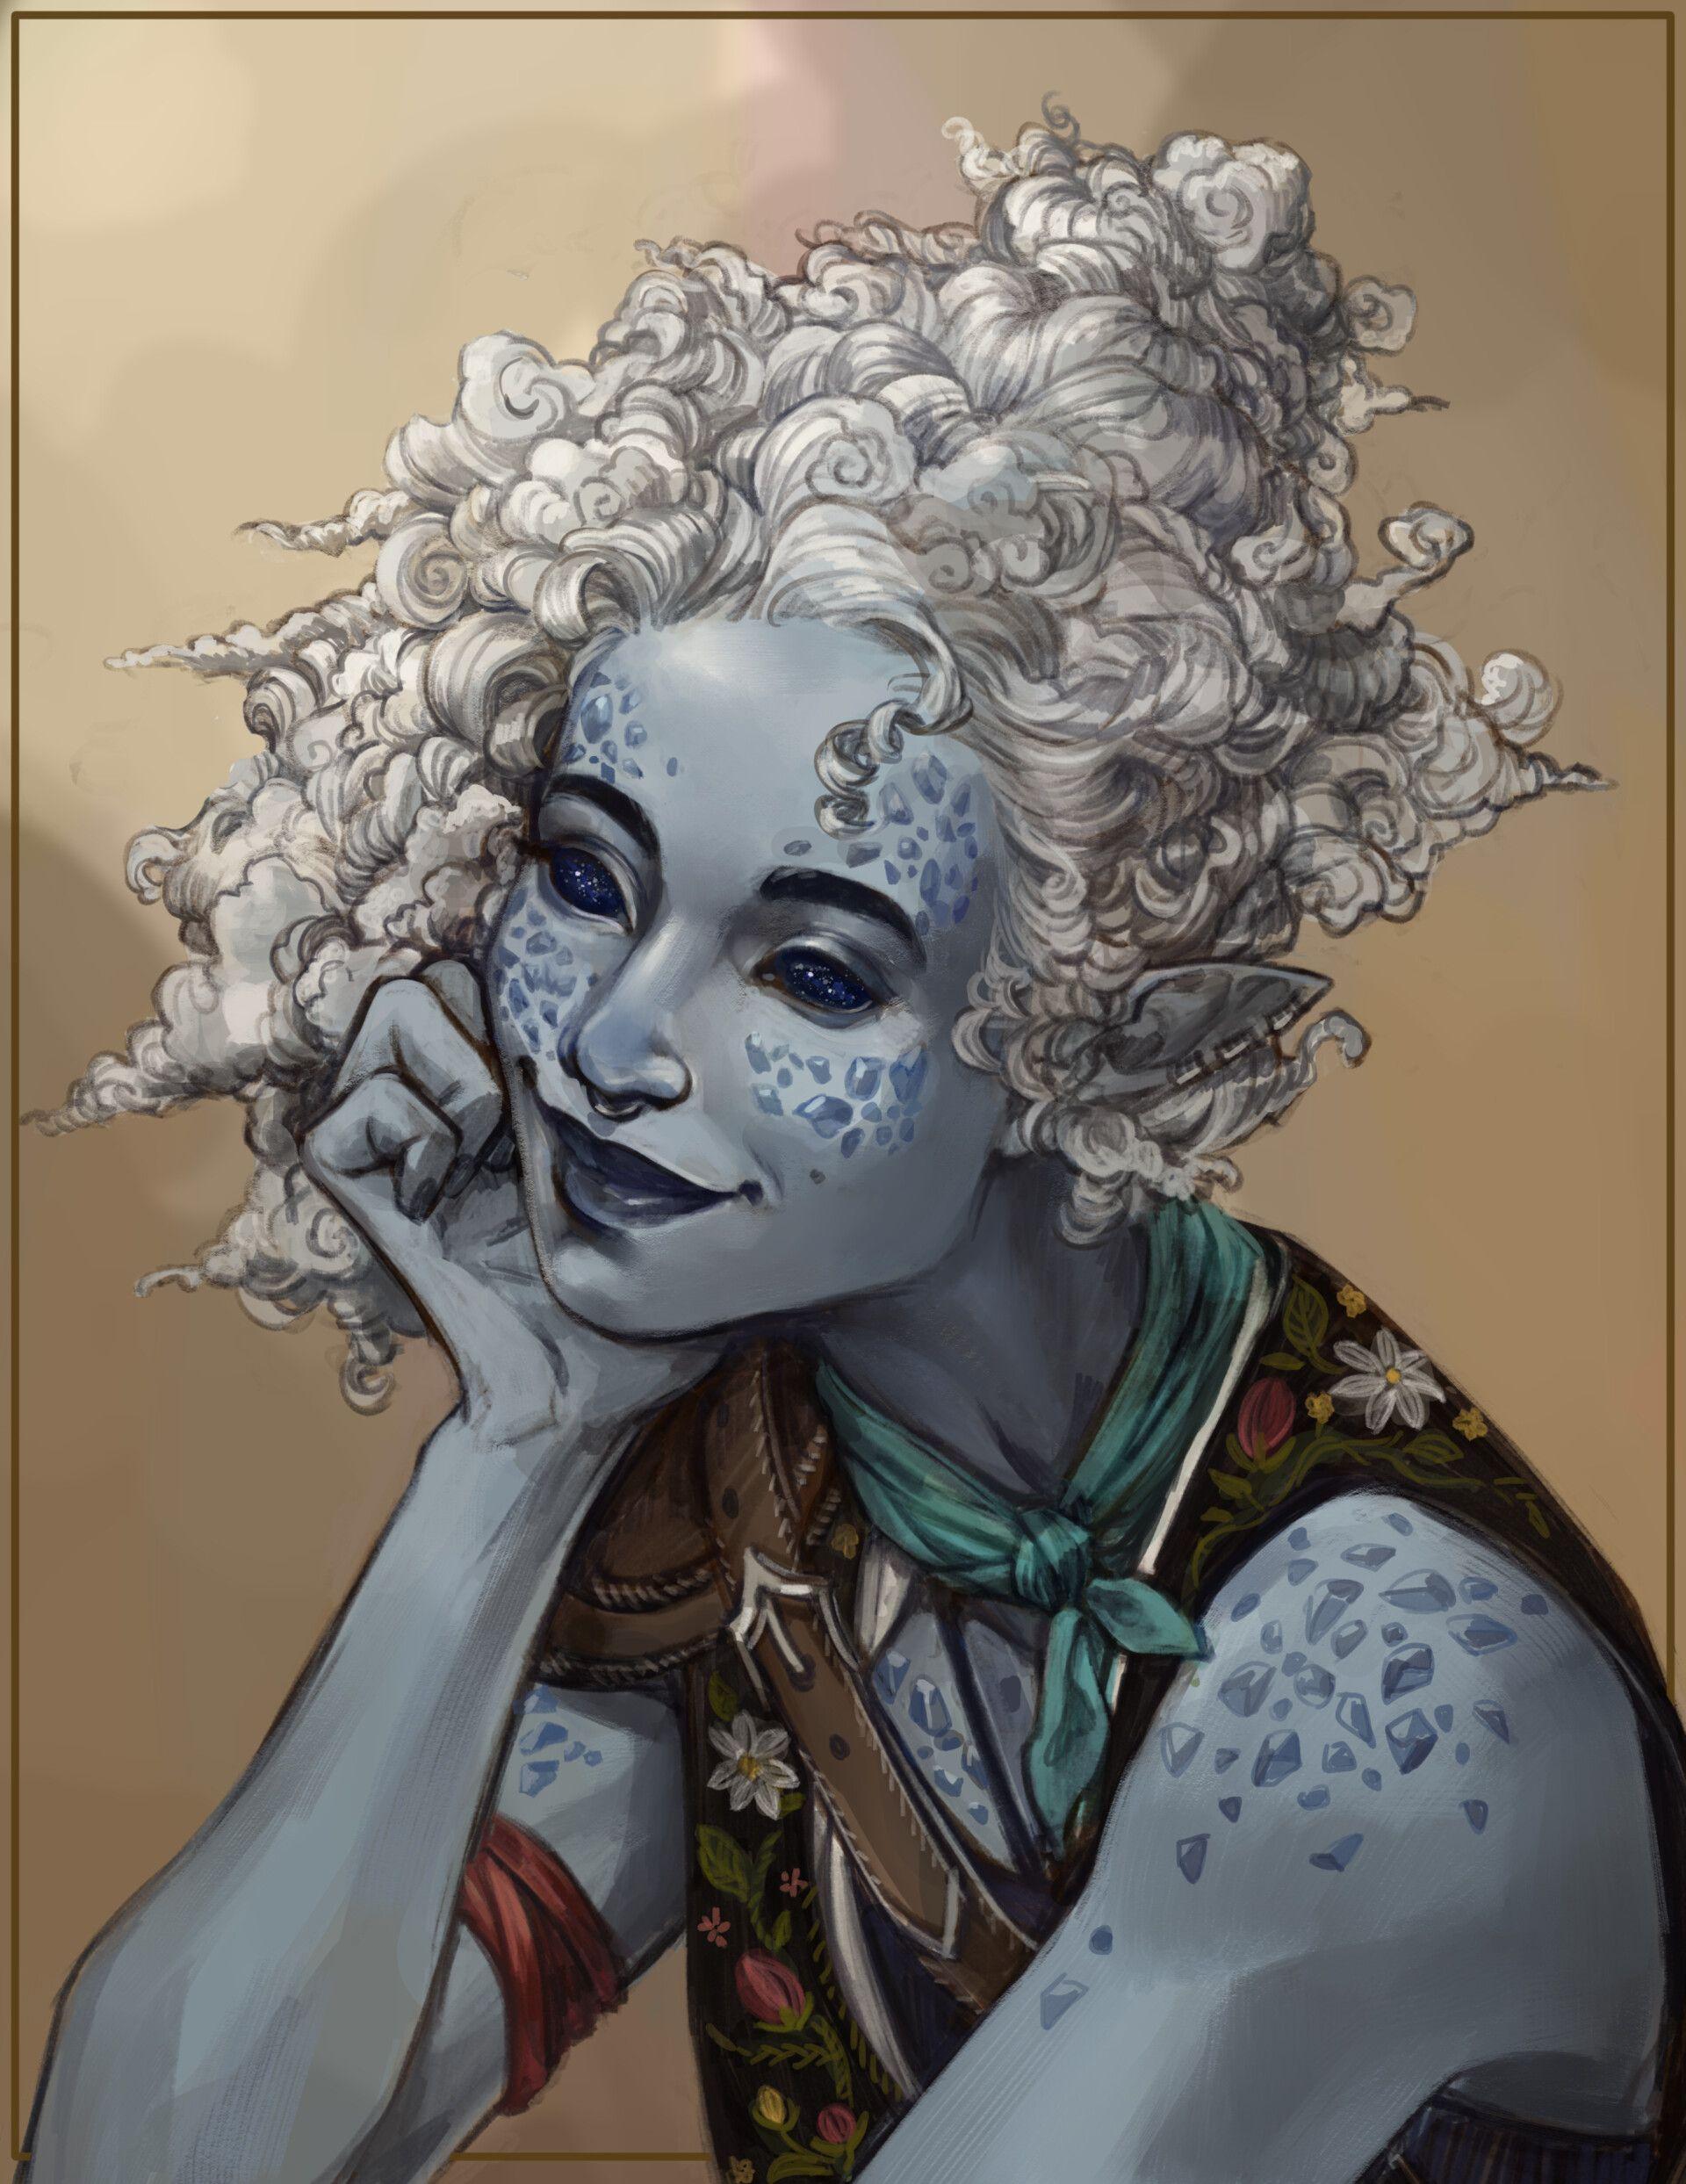 ArtStation - Fantasy Character Portraits, Anna Veltkamp